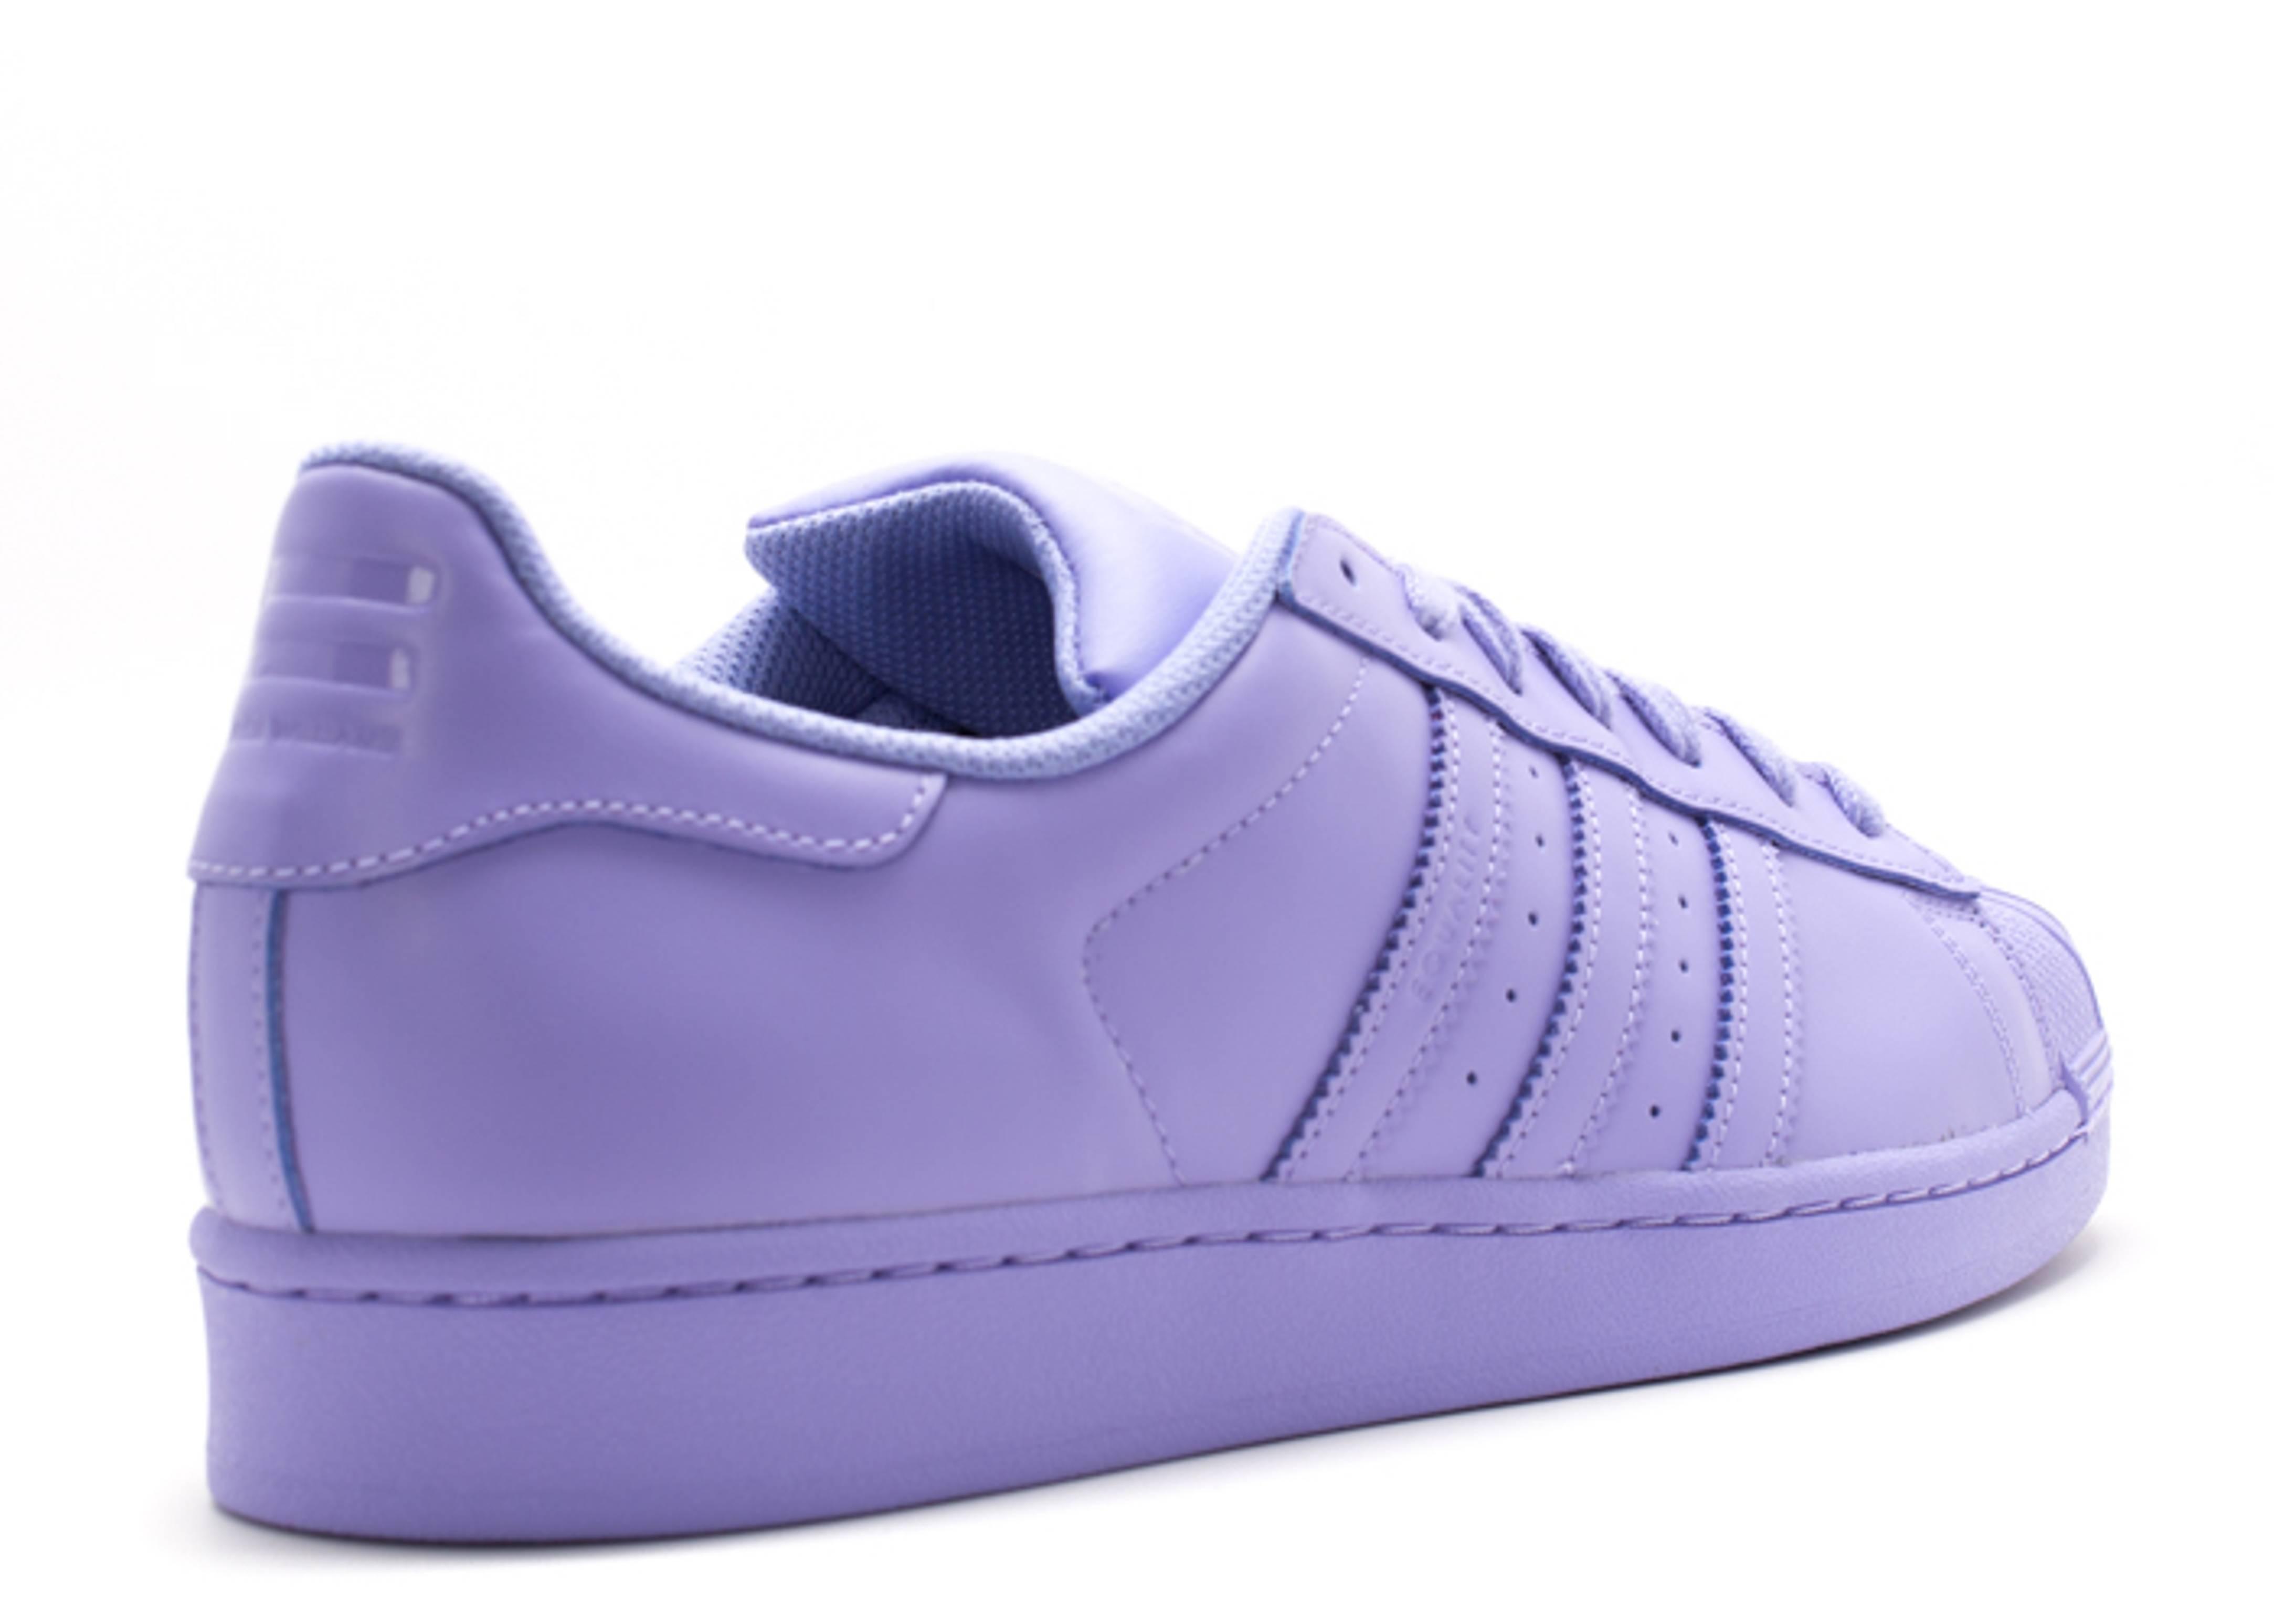 new concept b525f 52c55 adidas-superstar-supercolor-pharrell-ltflpu-prpl-201107 3.jpg